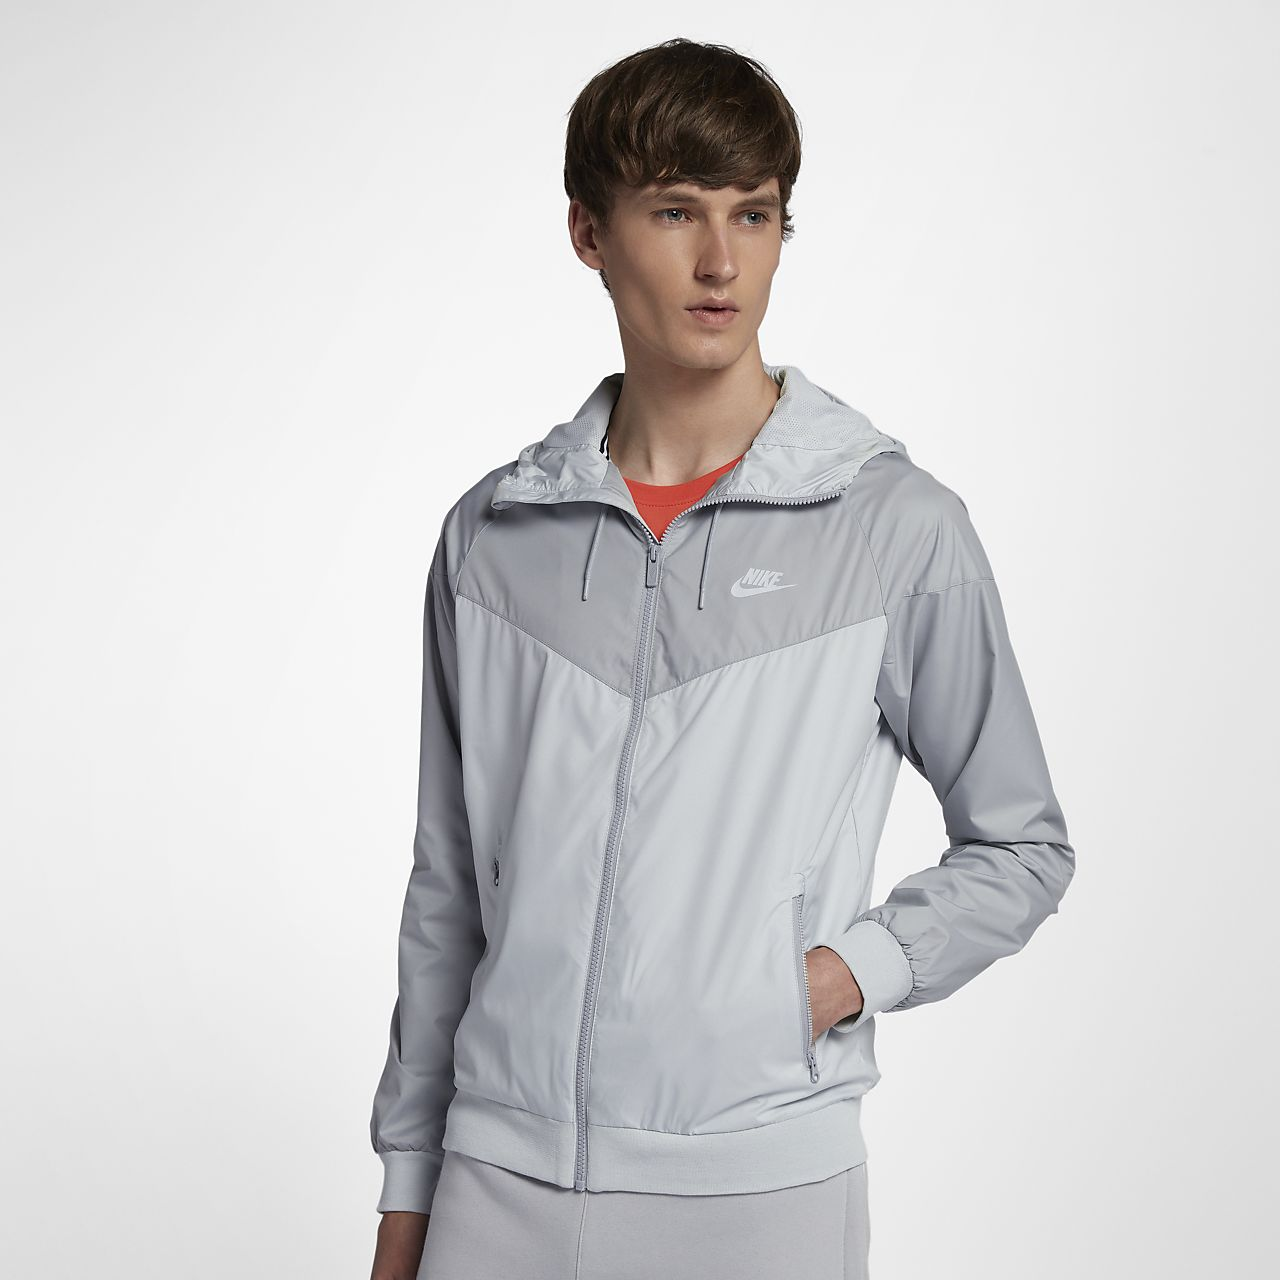 67738cf2 Nike Sportswear Windrunner-jakke for herre. Nike.com NO